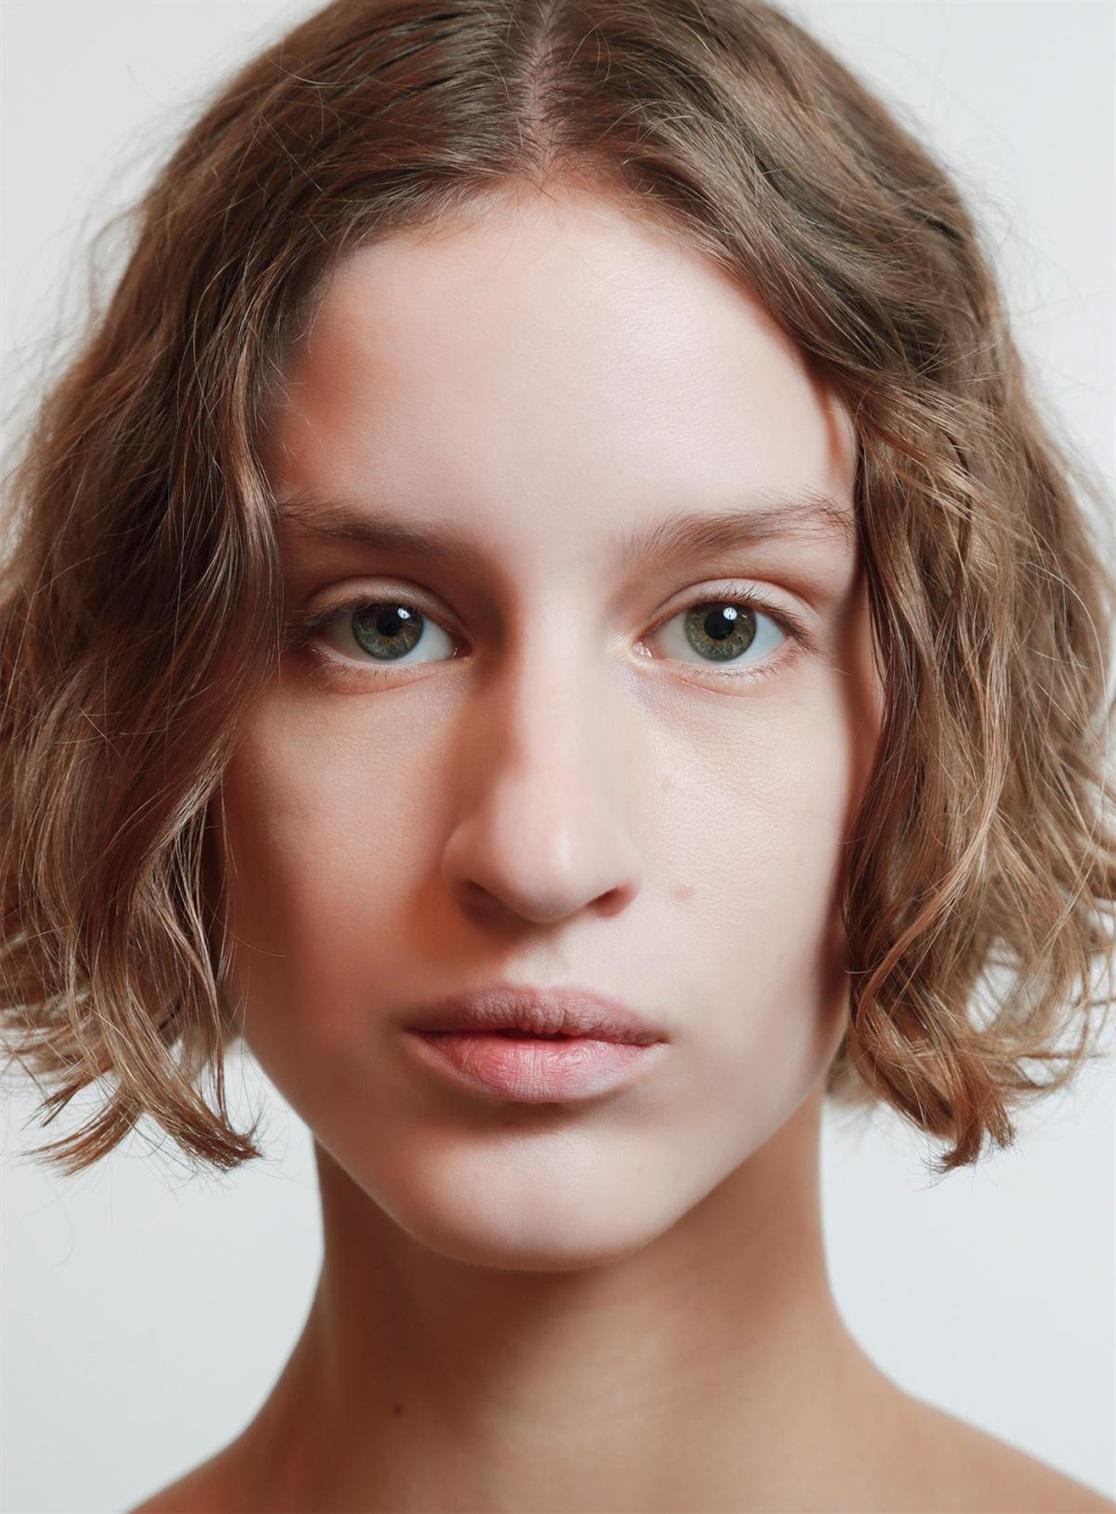 Short Hair Trends 2021 for Wavy Hair